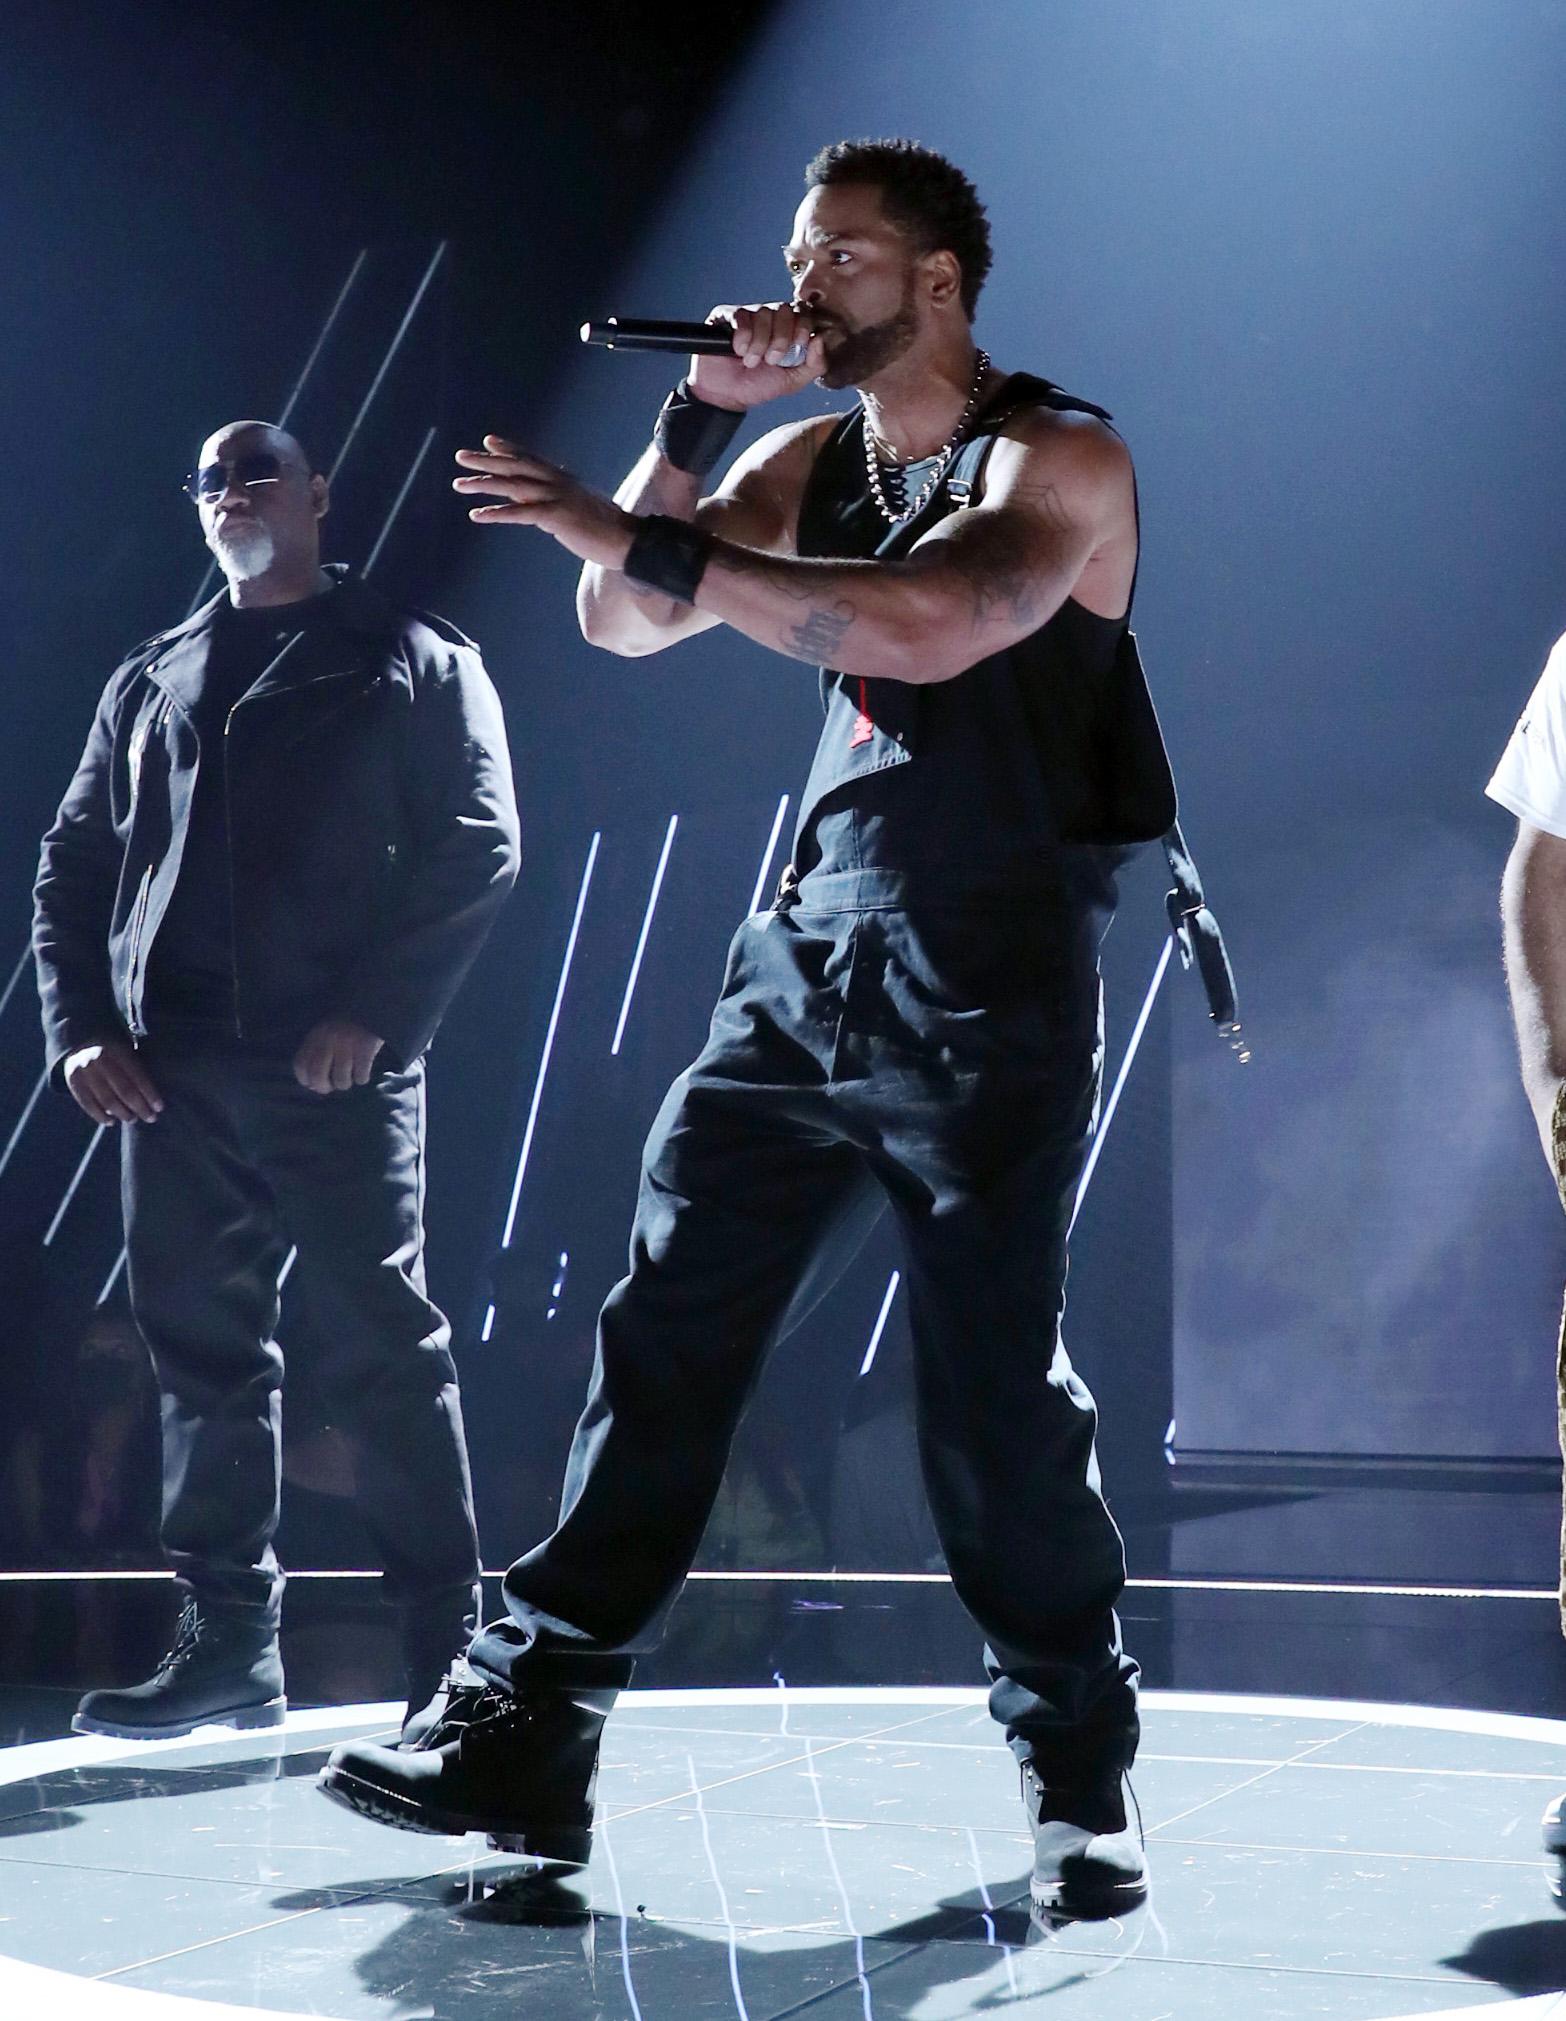 Method Man, Griselda & More Honored DMX At 2021 BET Awards [Video]